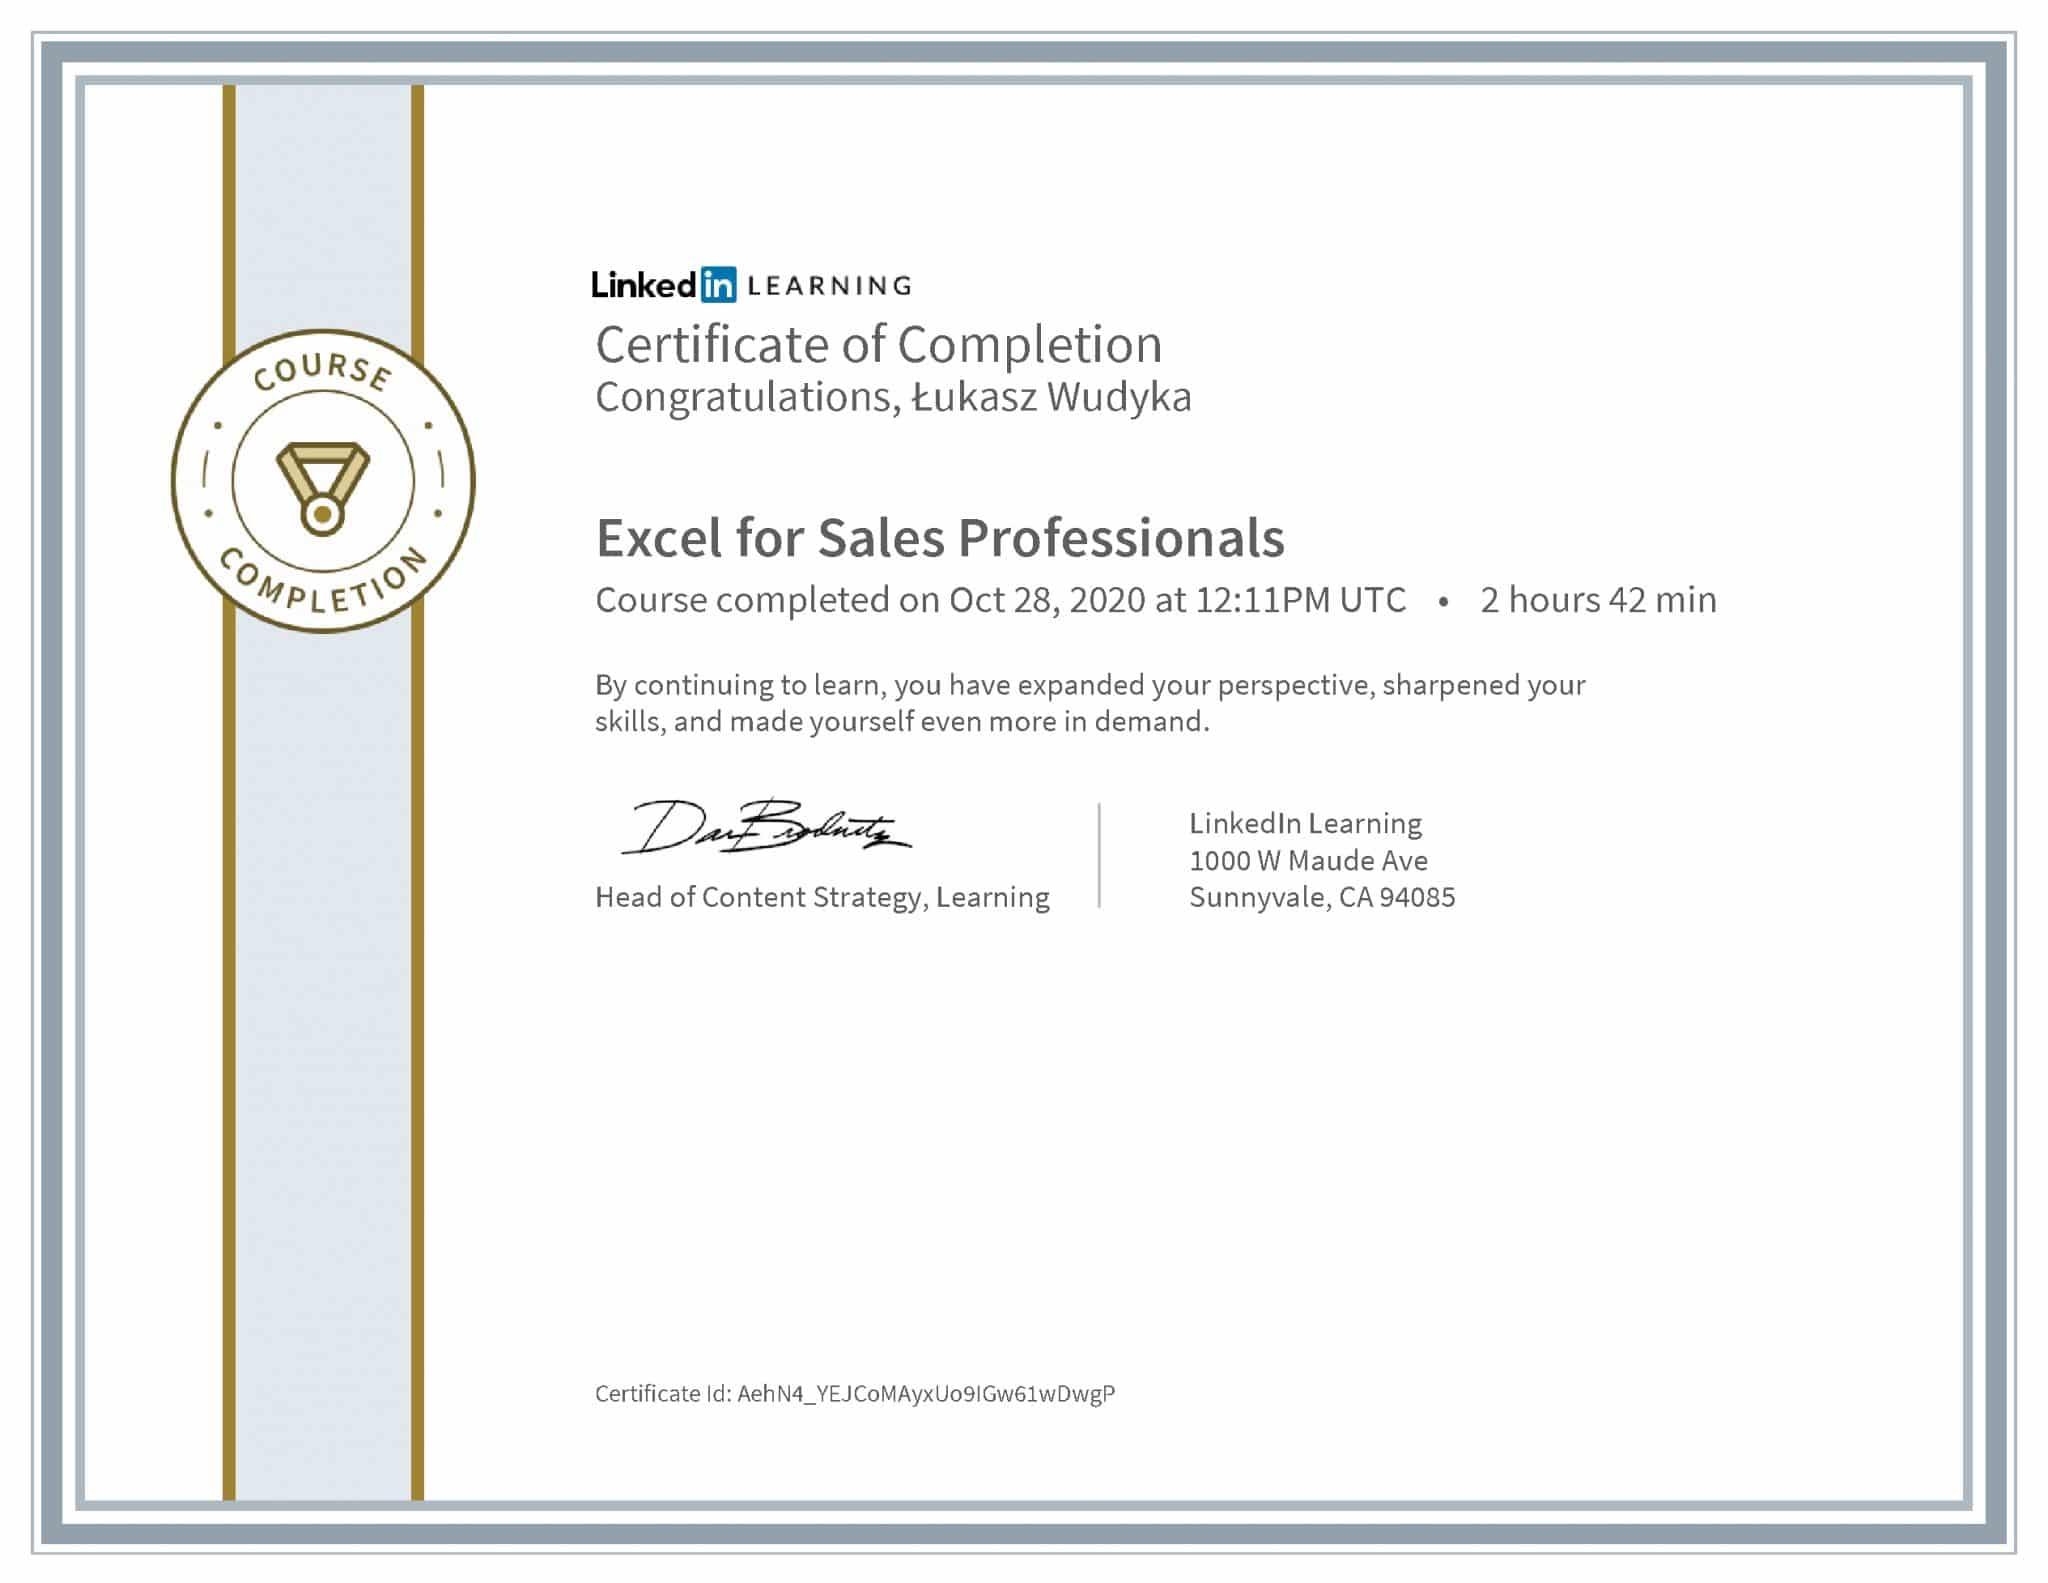 Łukasz Wudyka certyfikat LinkedIn Excel for Sales Professionals